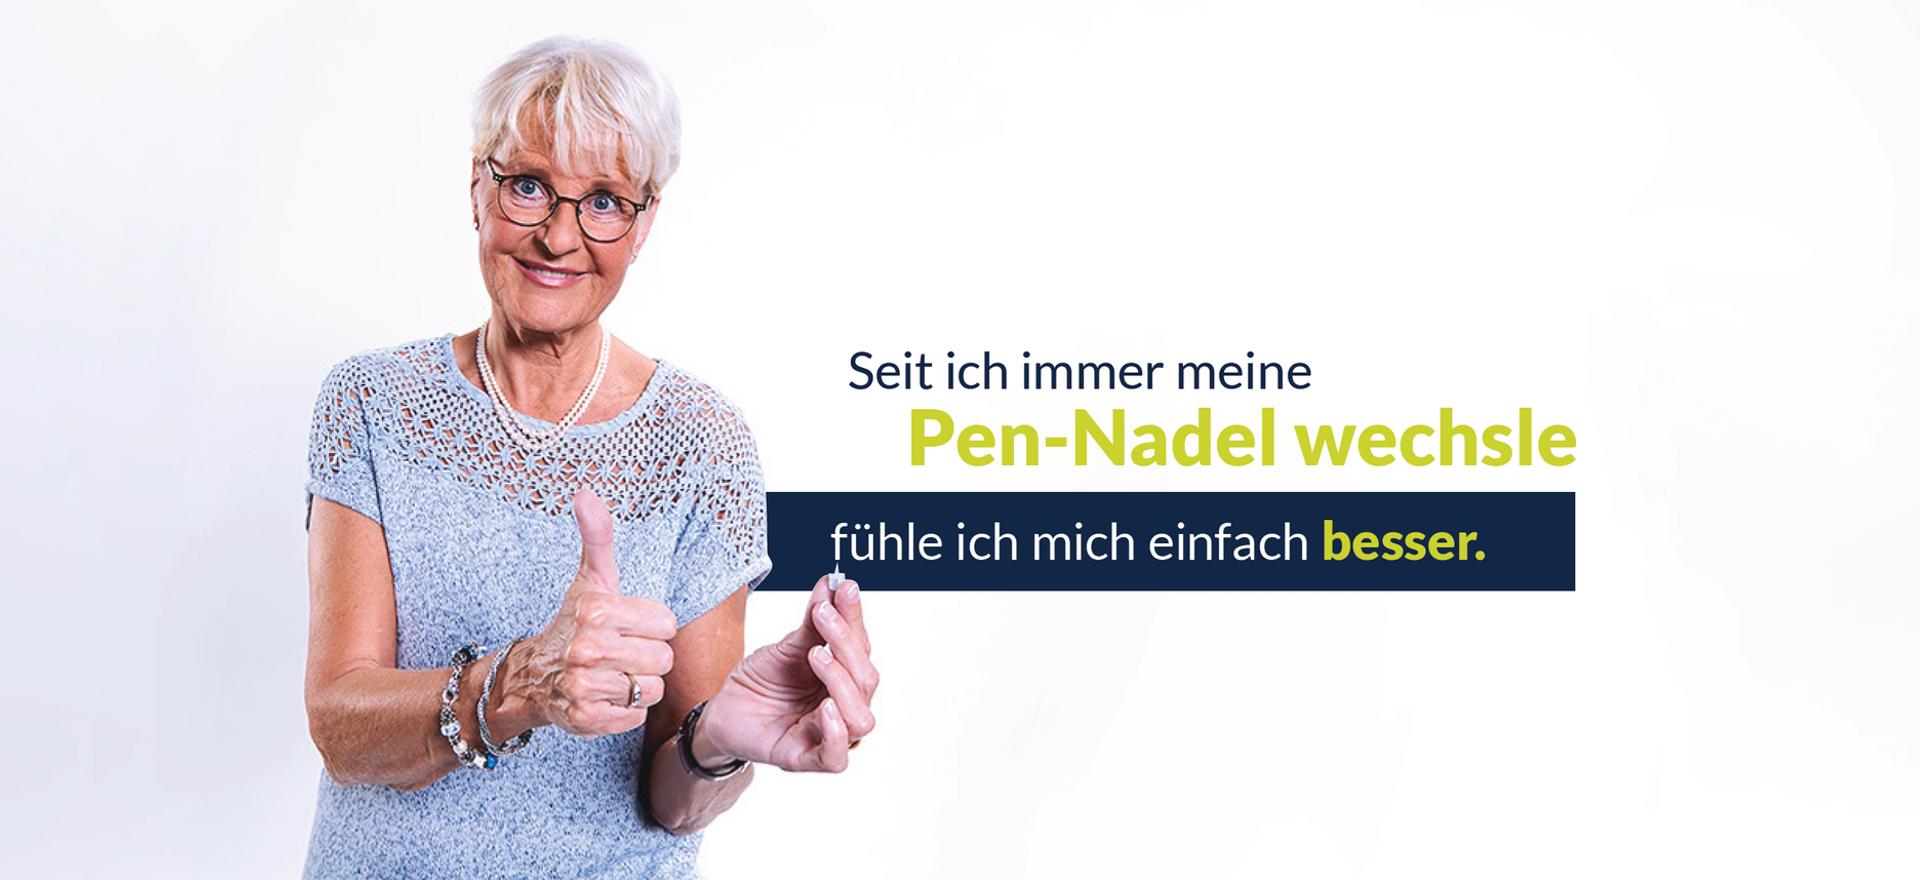 nadelwechsel_header_besser.png